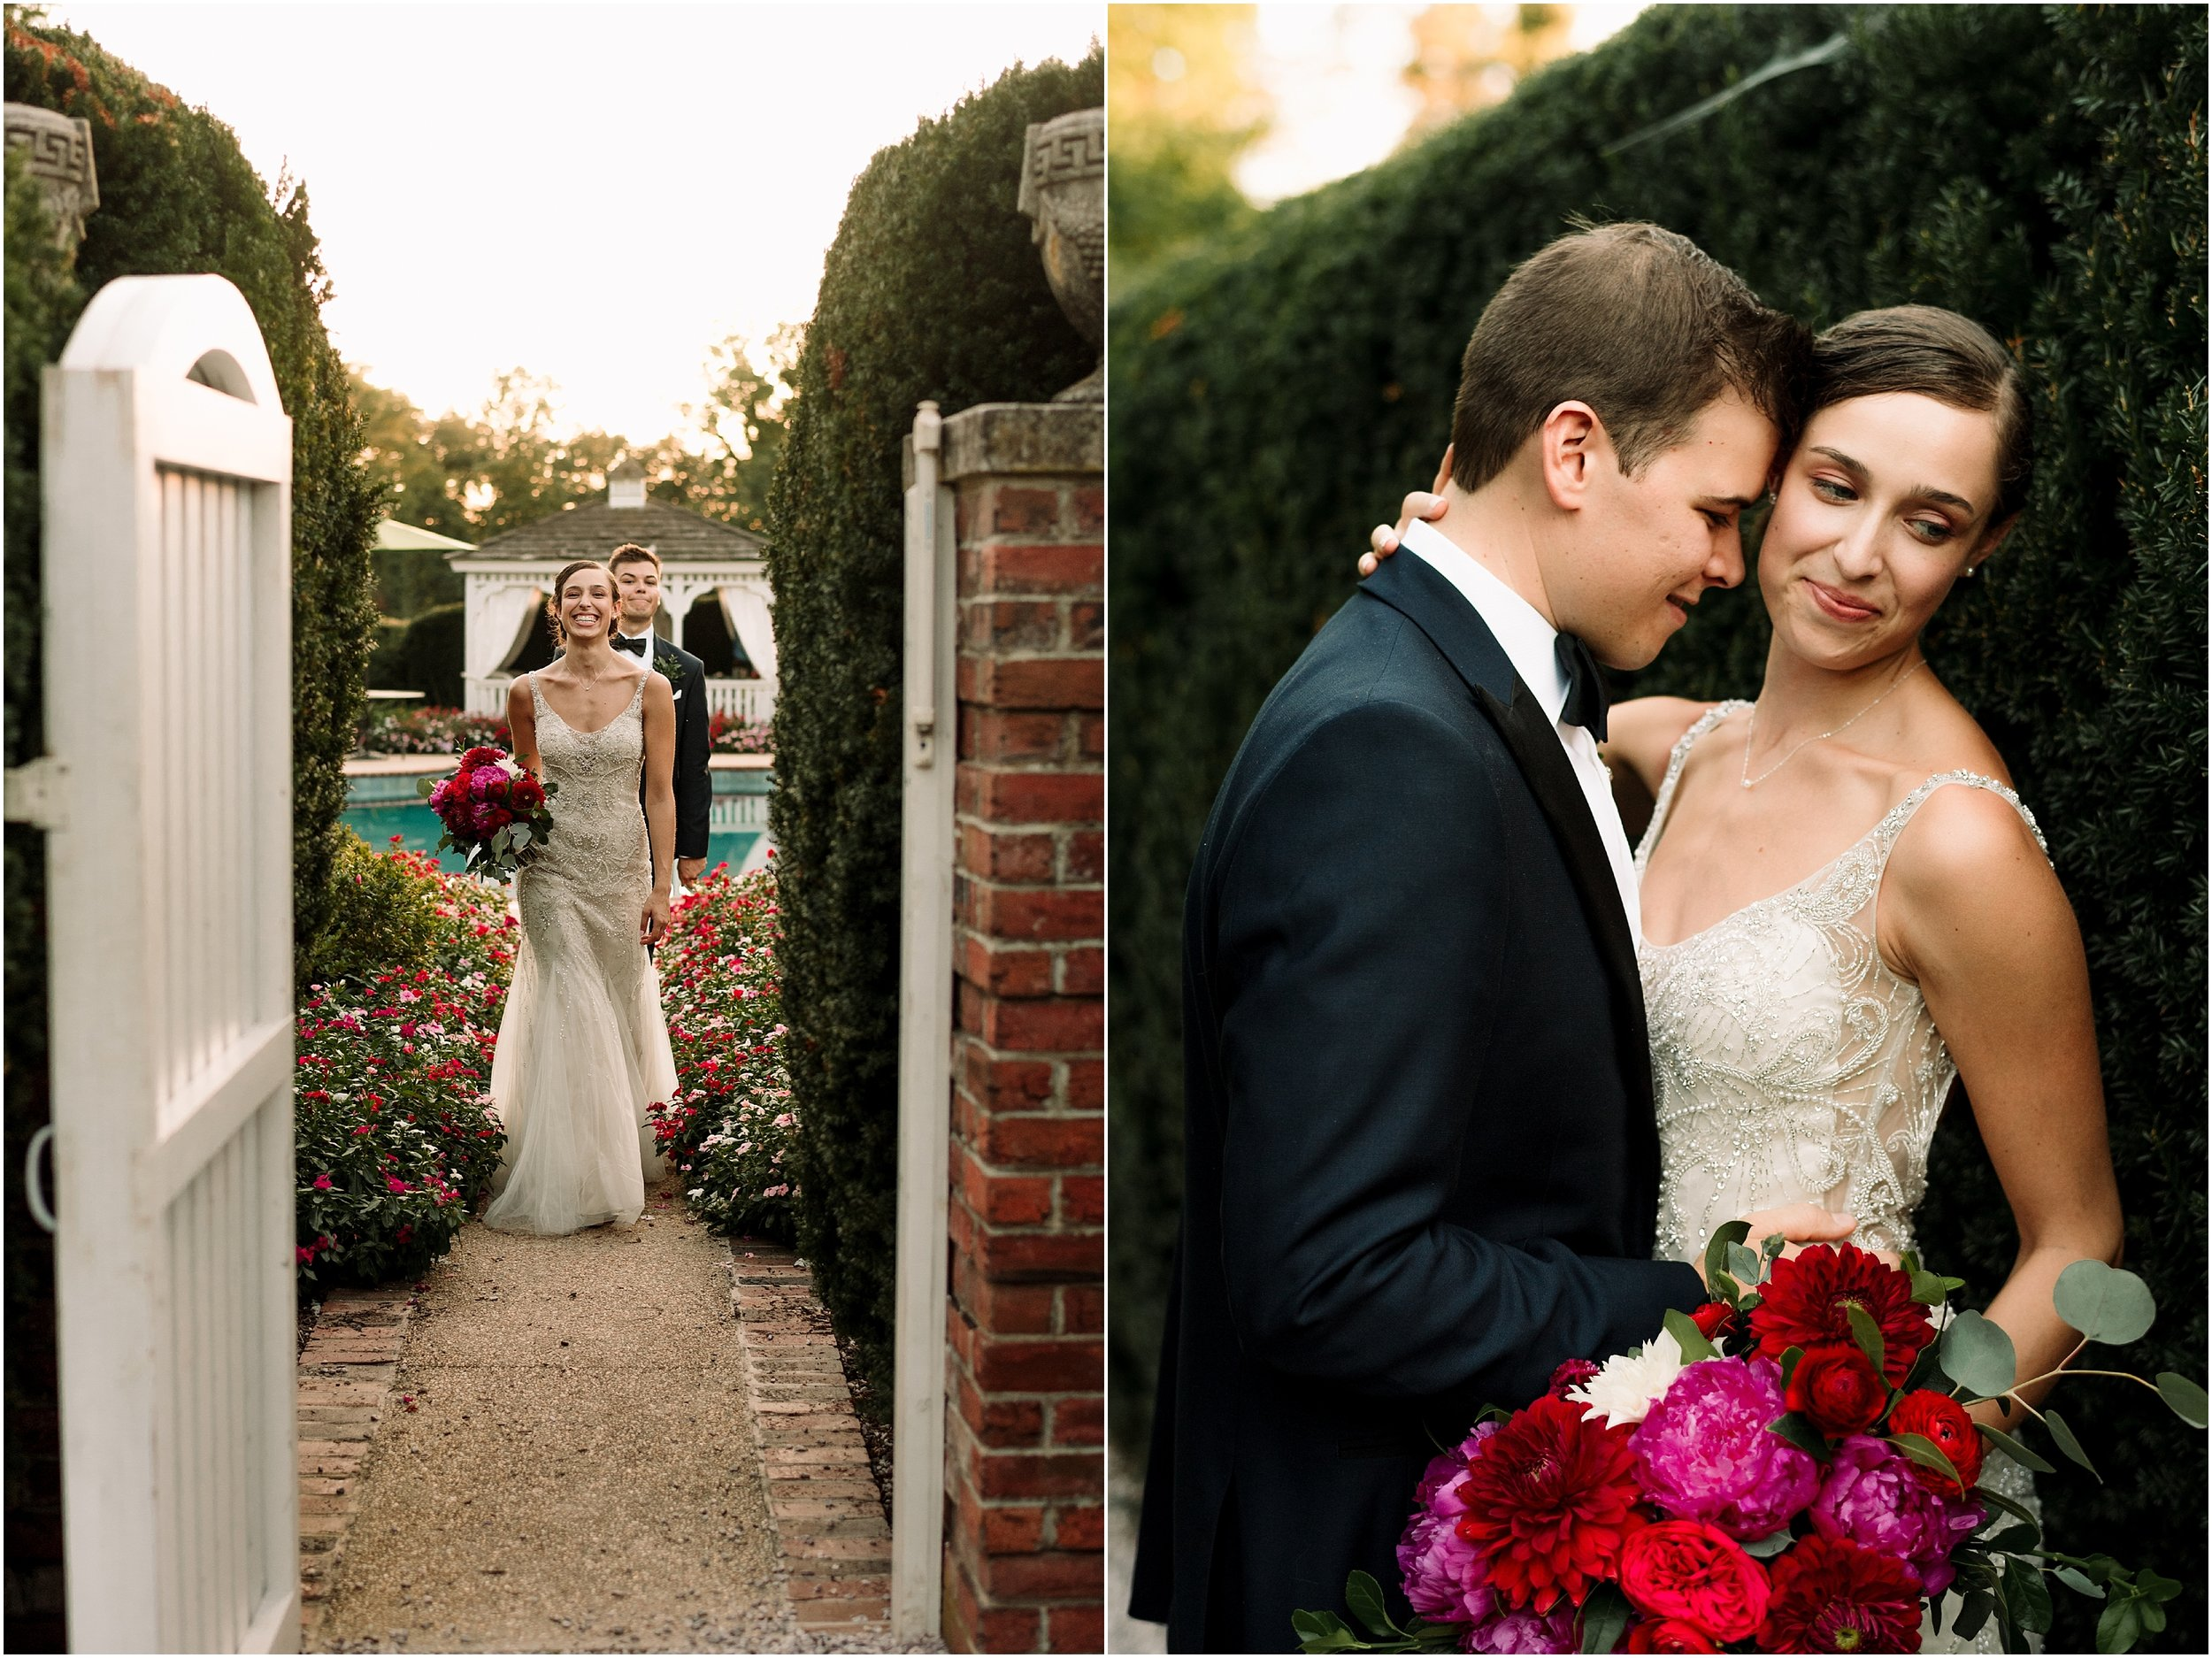 hannah leigh photography Antrim 1844 Wedding_1252.jpg